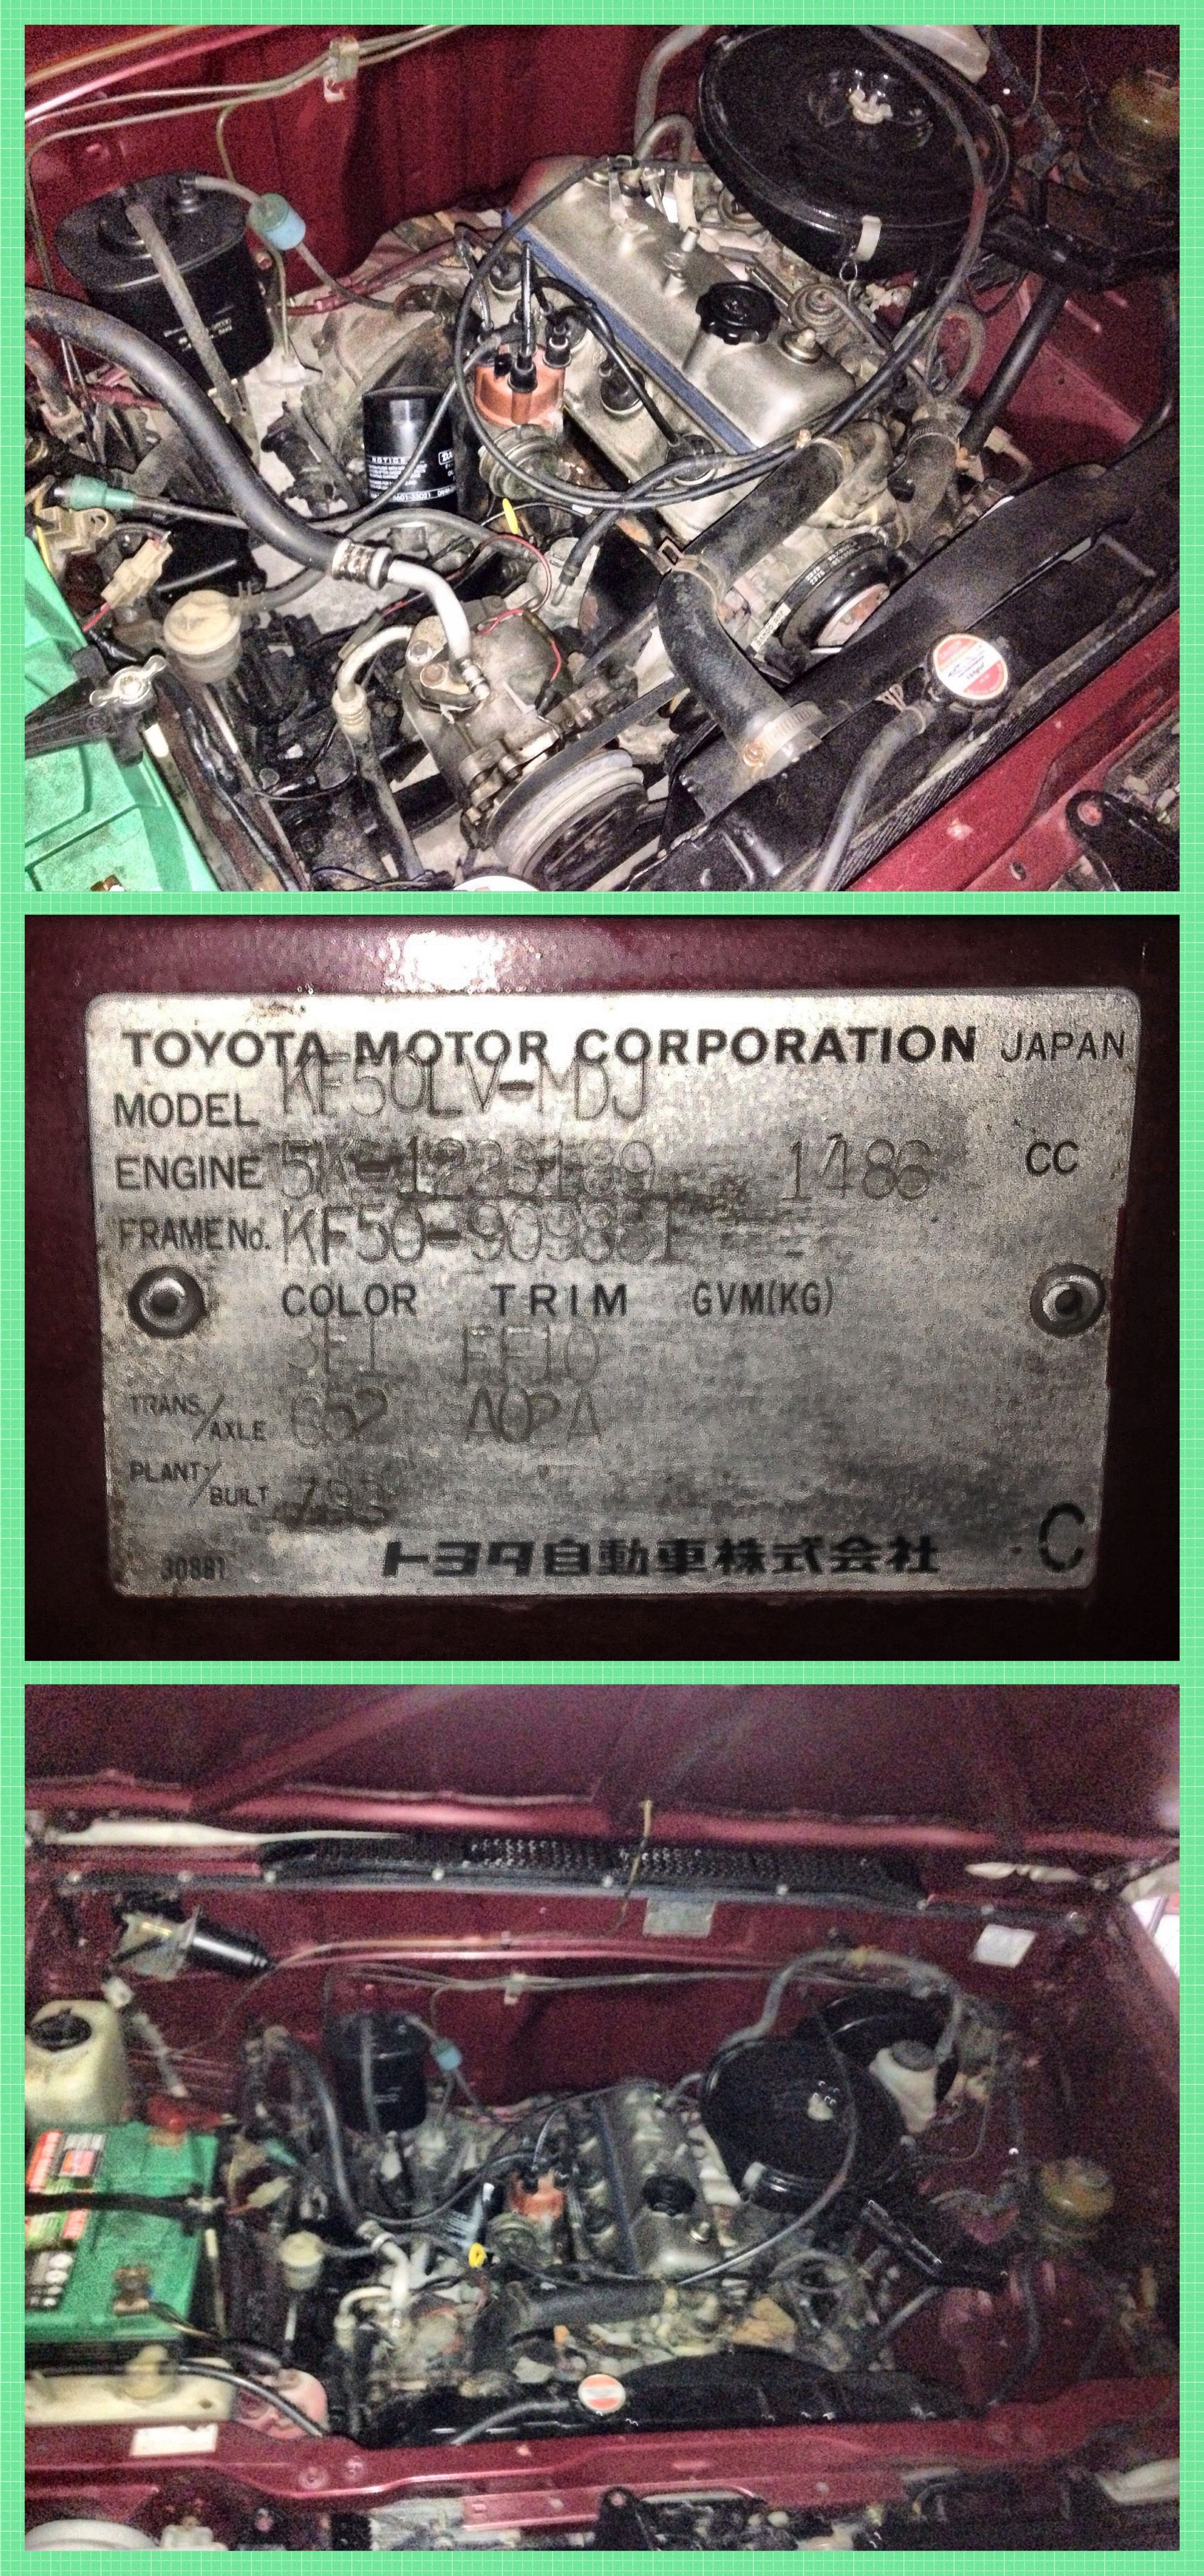 1995 Toyota Tamaraw FX with a 5K Gasoline Engine.